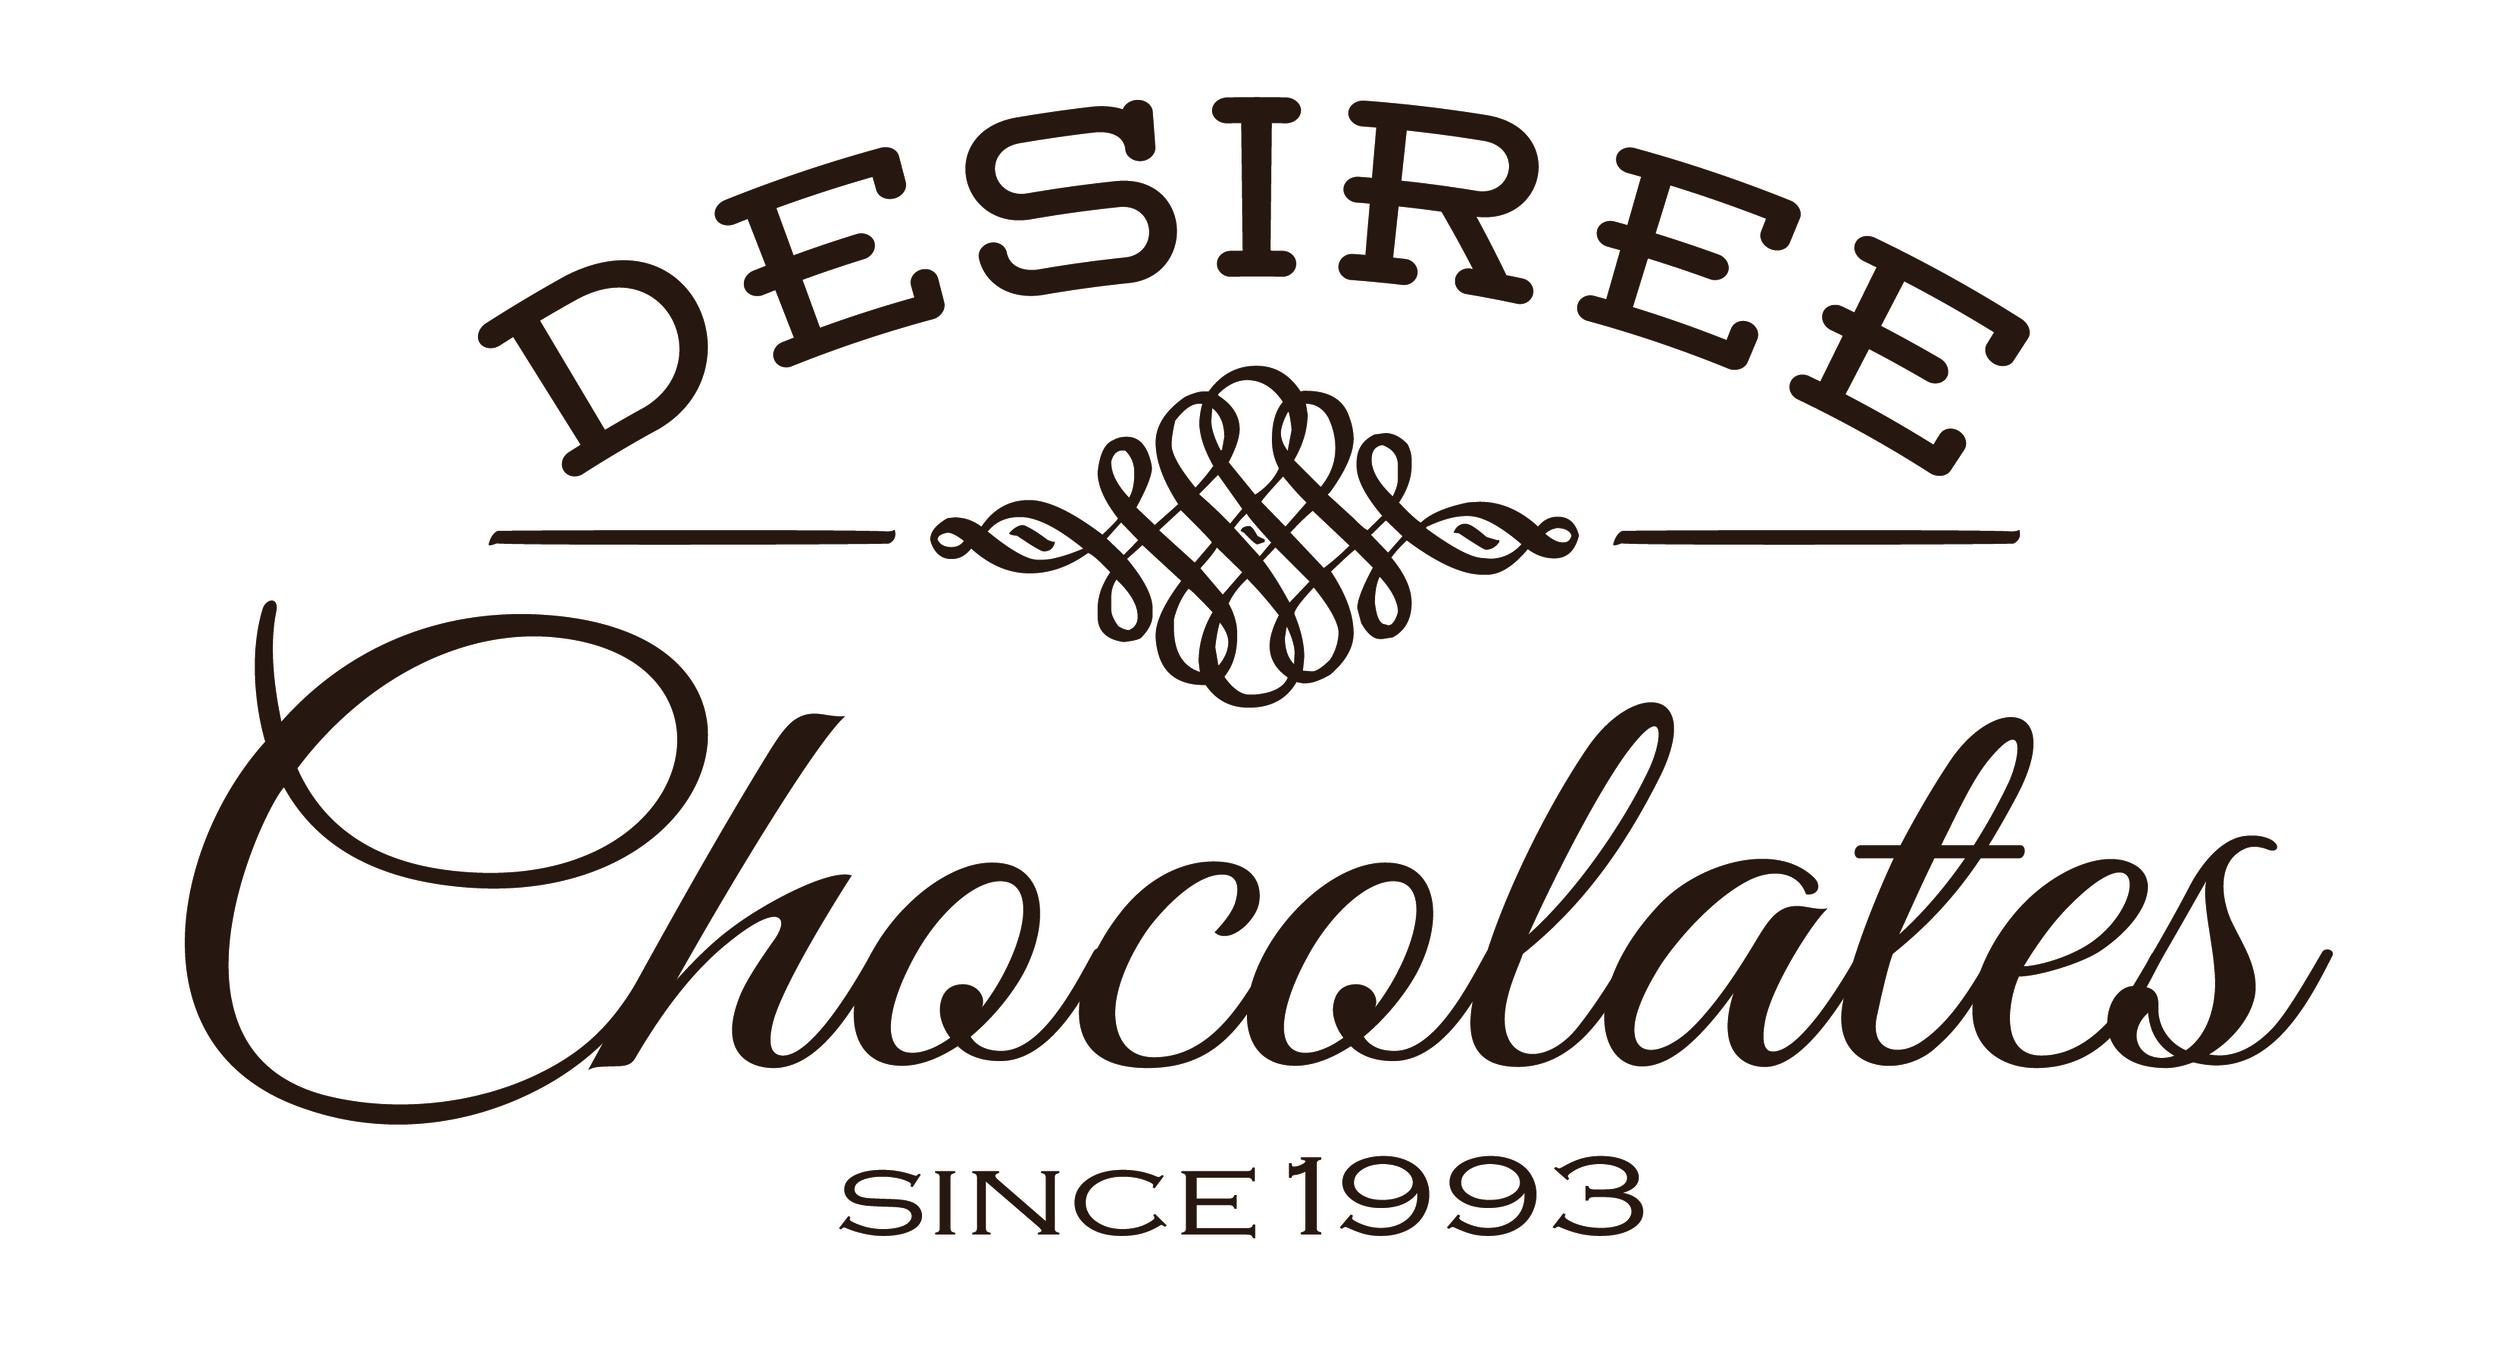 Logo Design for Desiree Chocolates - Chicago, IL